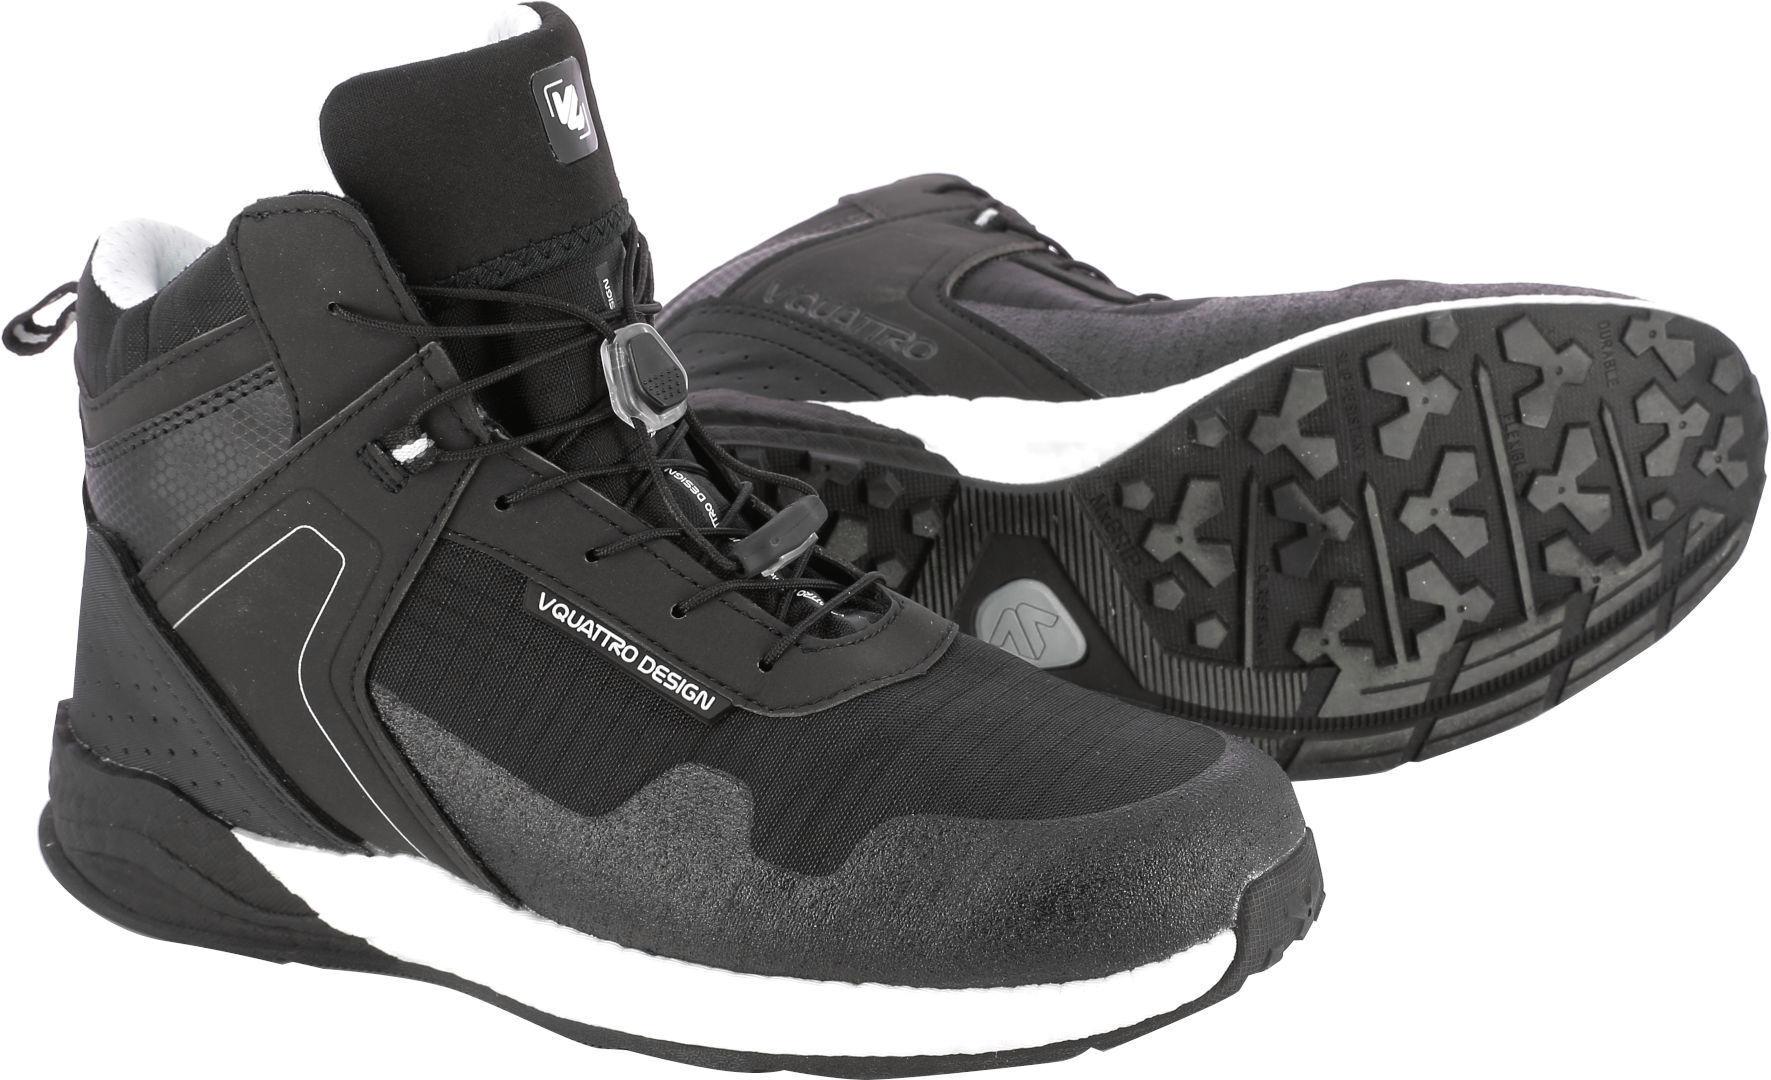 VQuattro Ridge Motorcycle Shoes Black 45